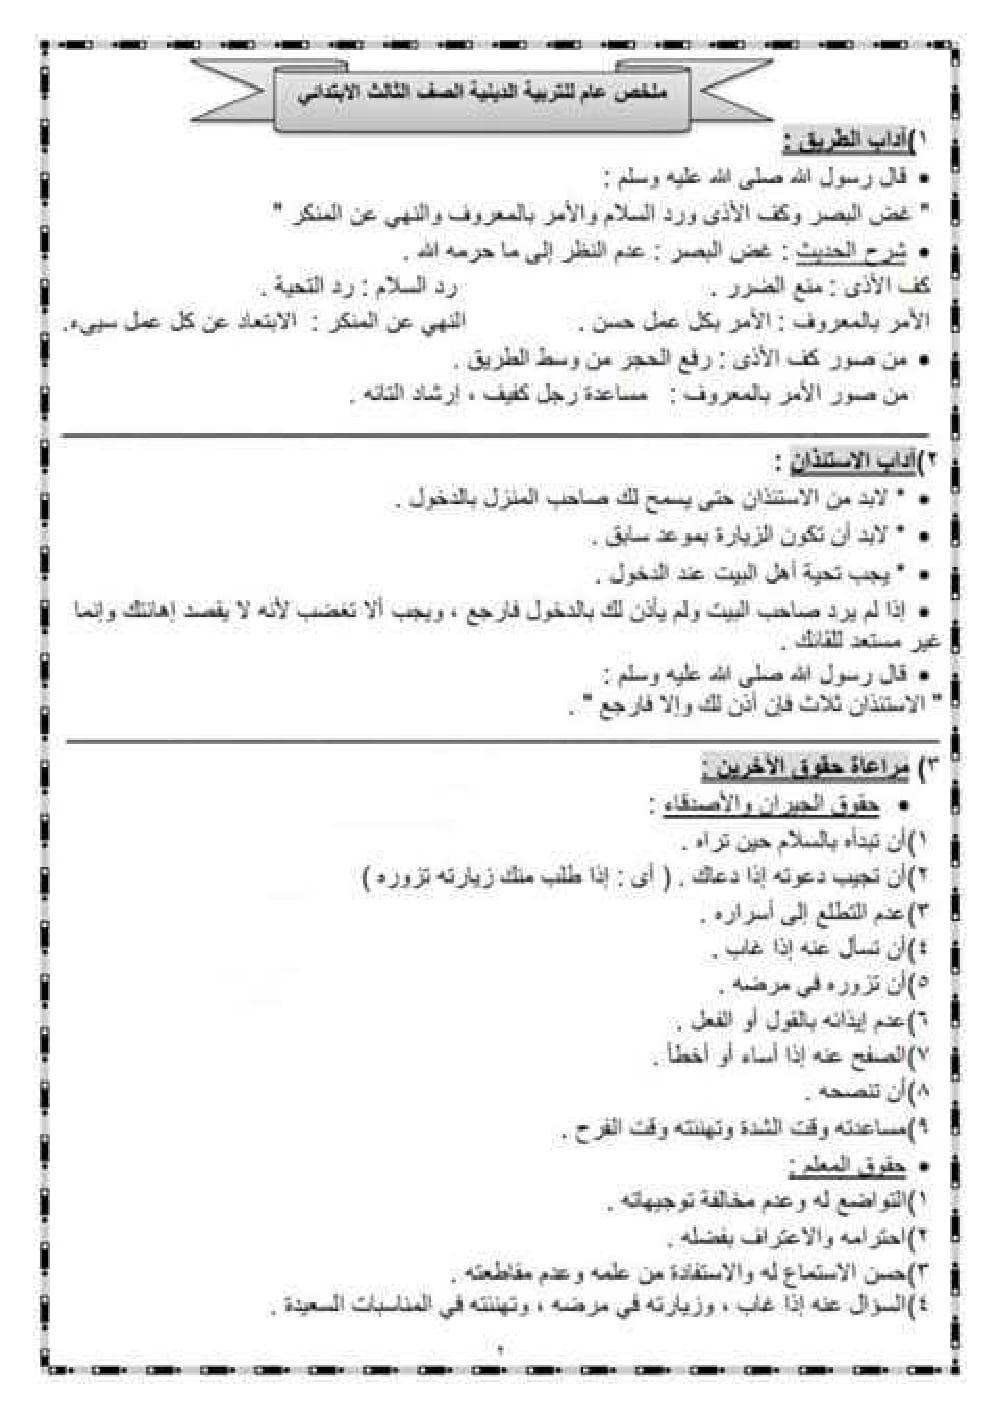 exam-eg.com_152474858445091.jpg